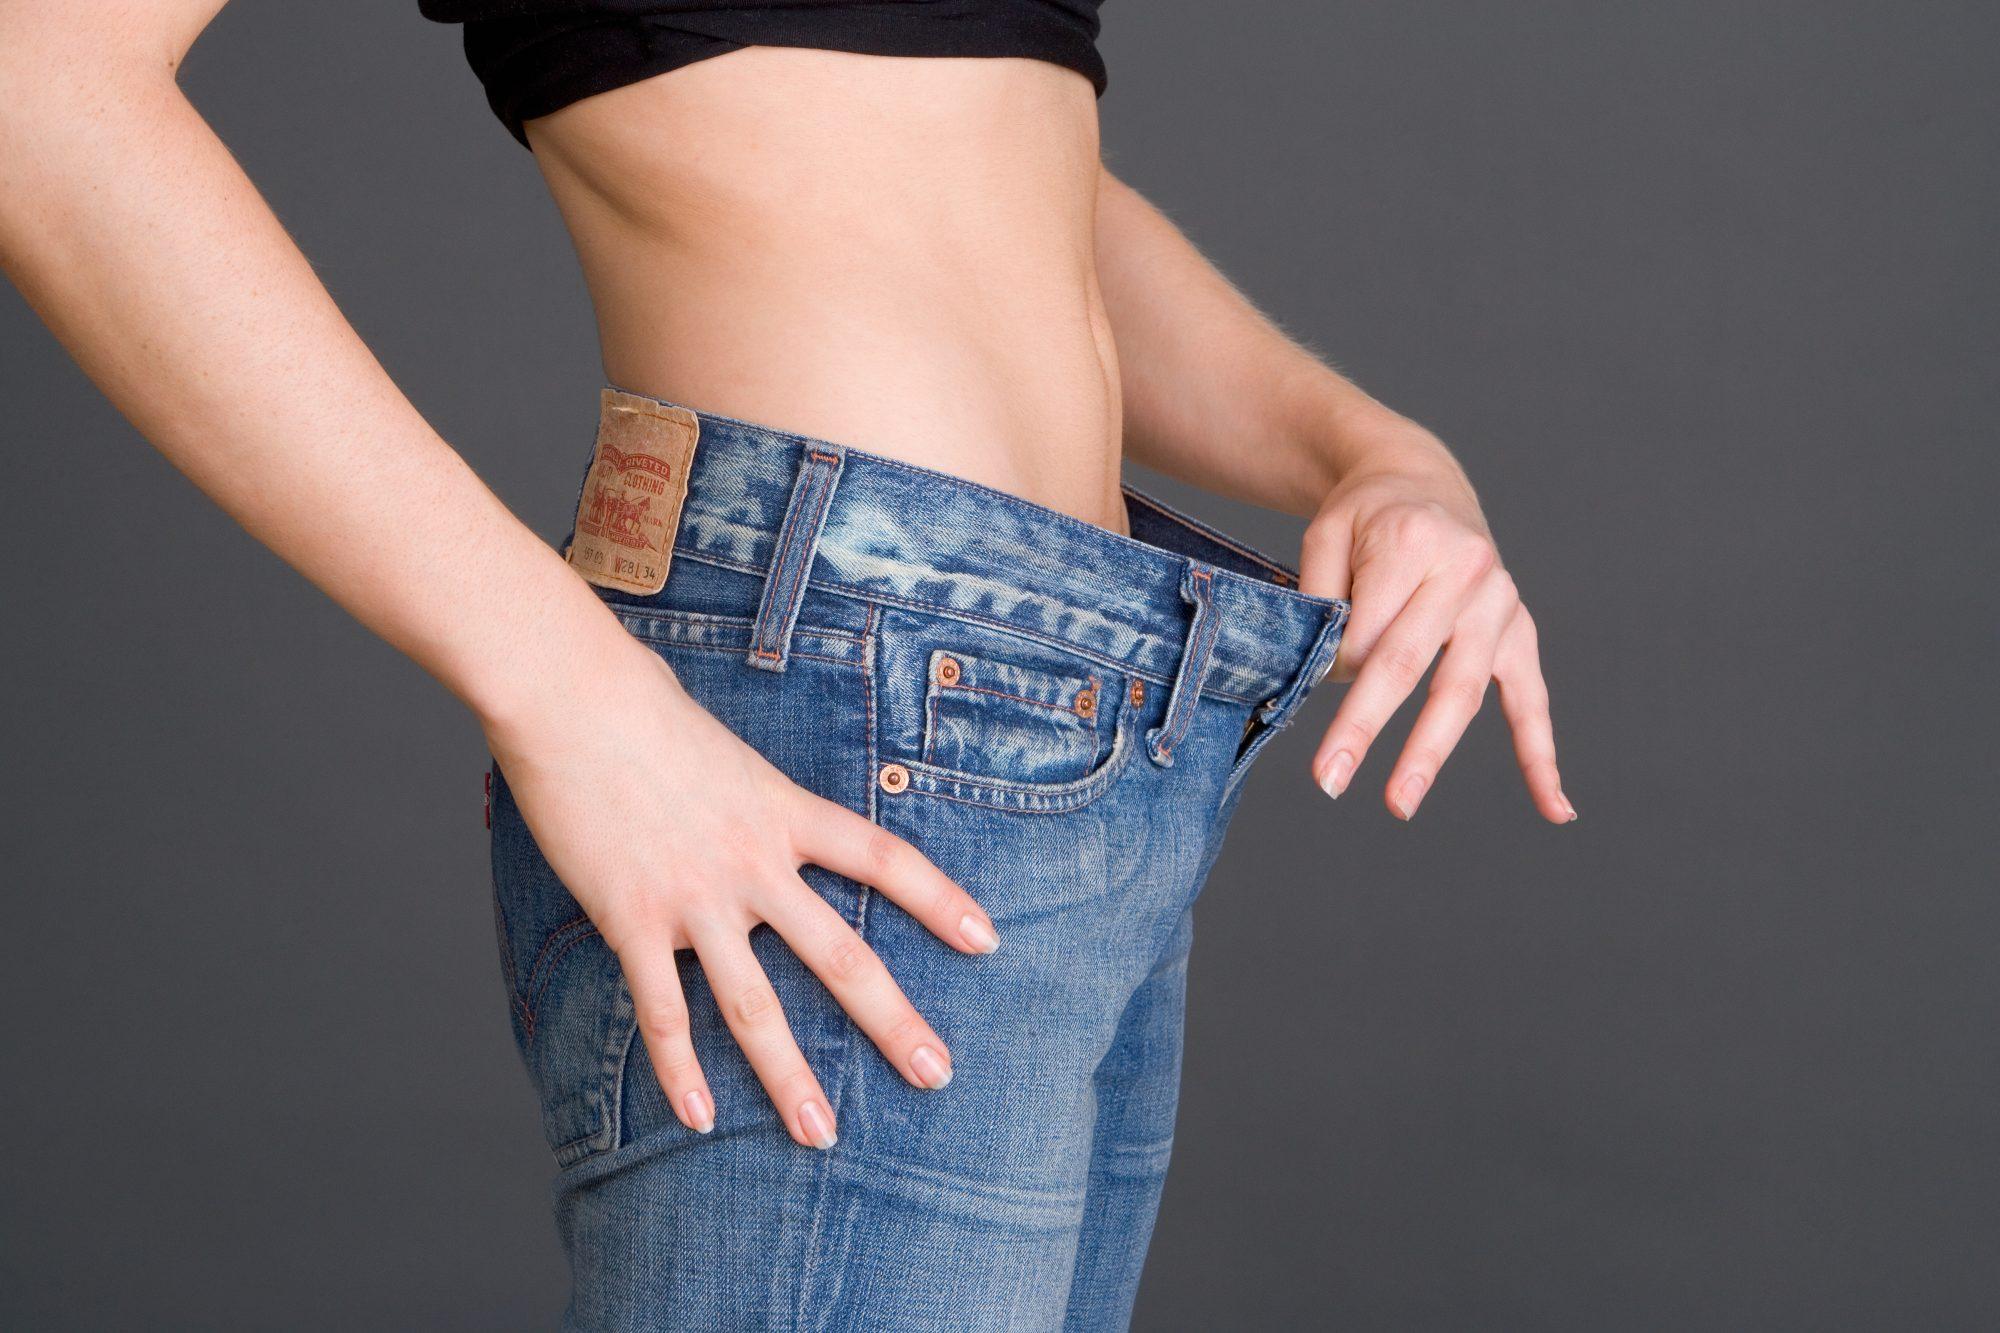 Mujer pantalón perder peso